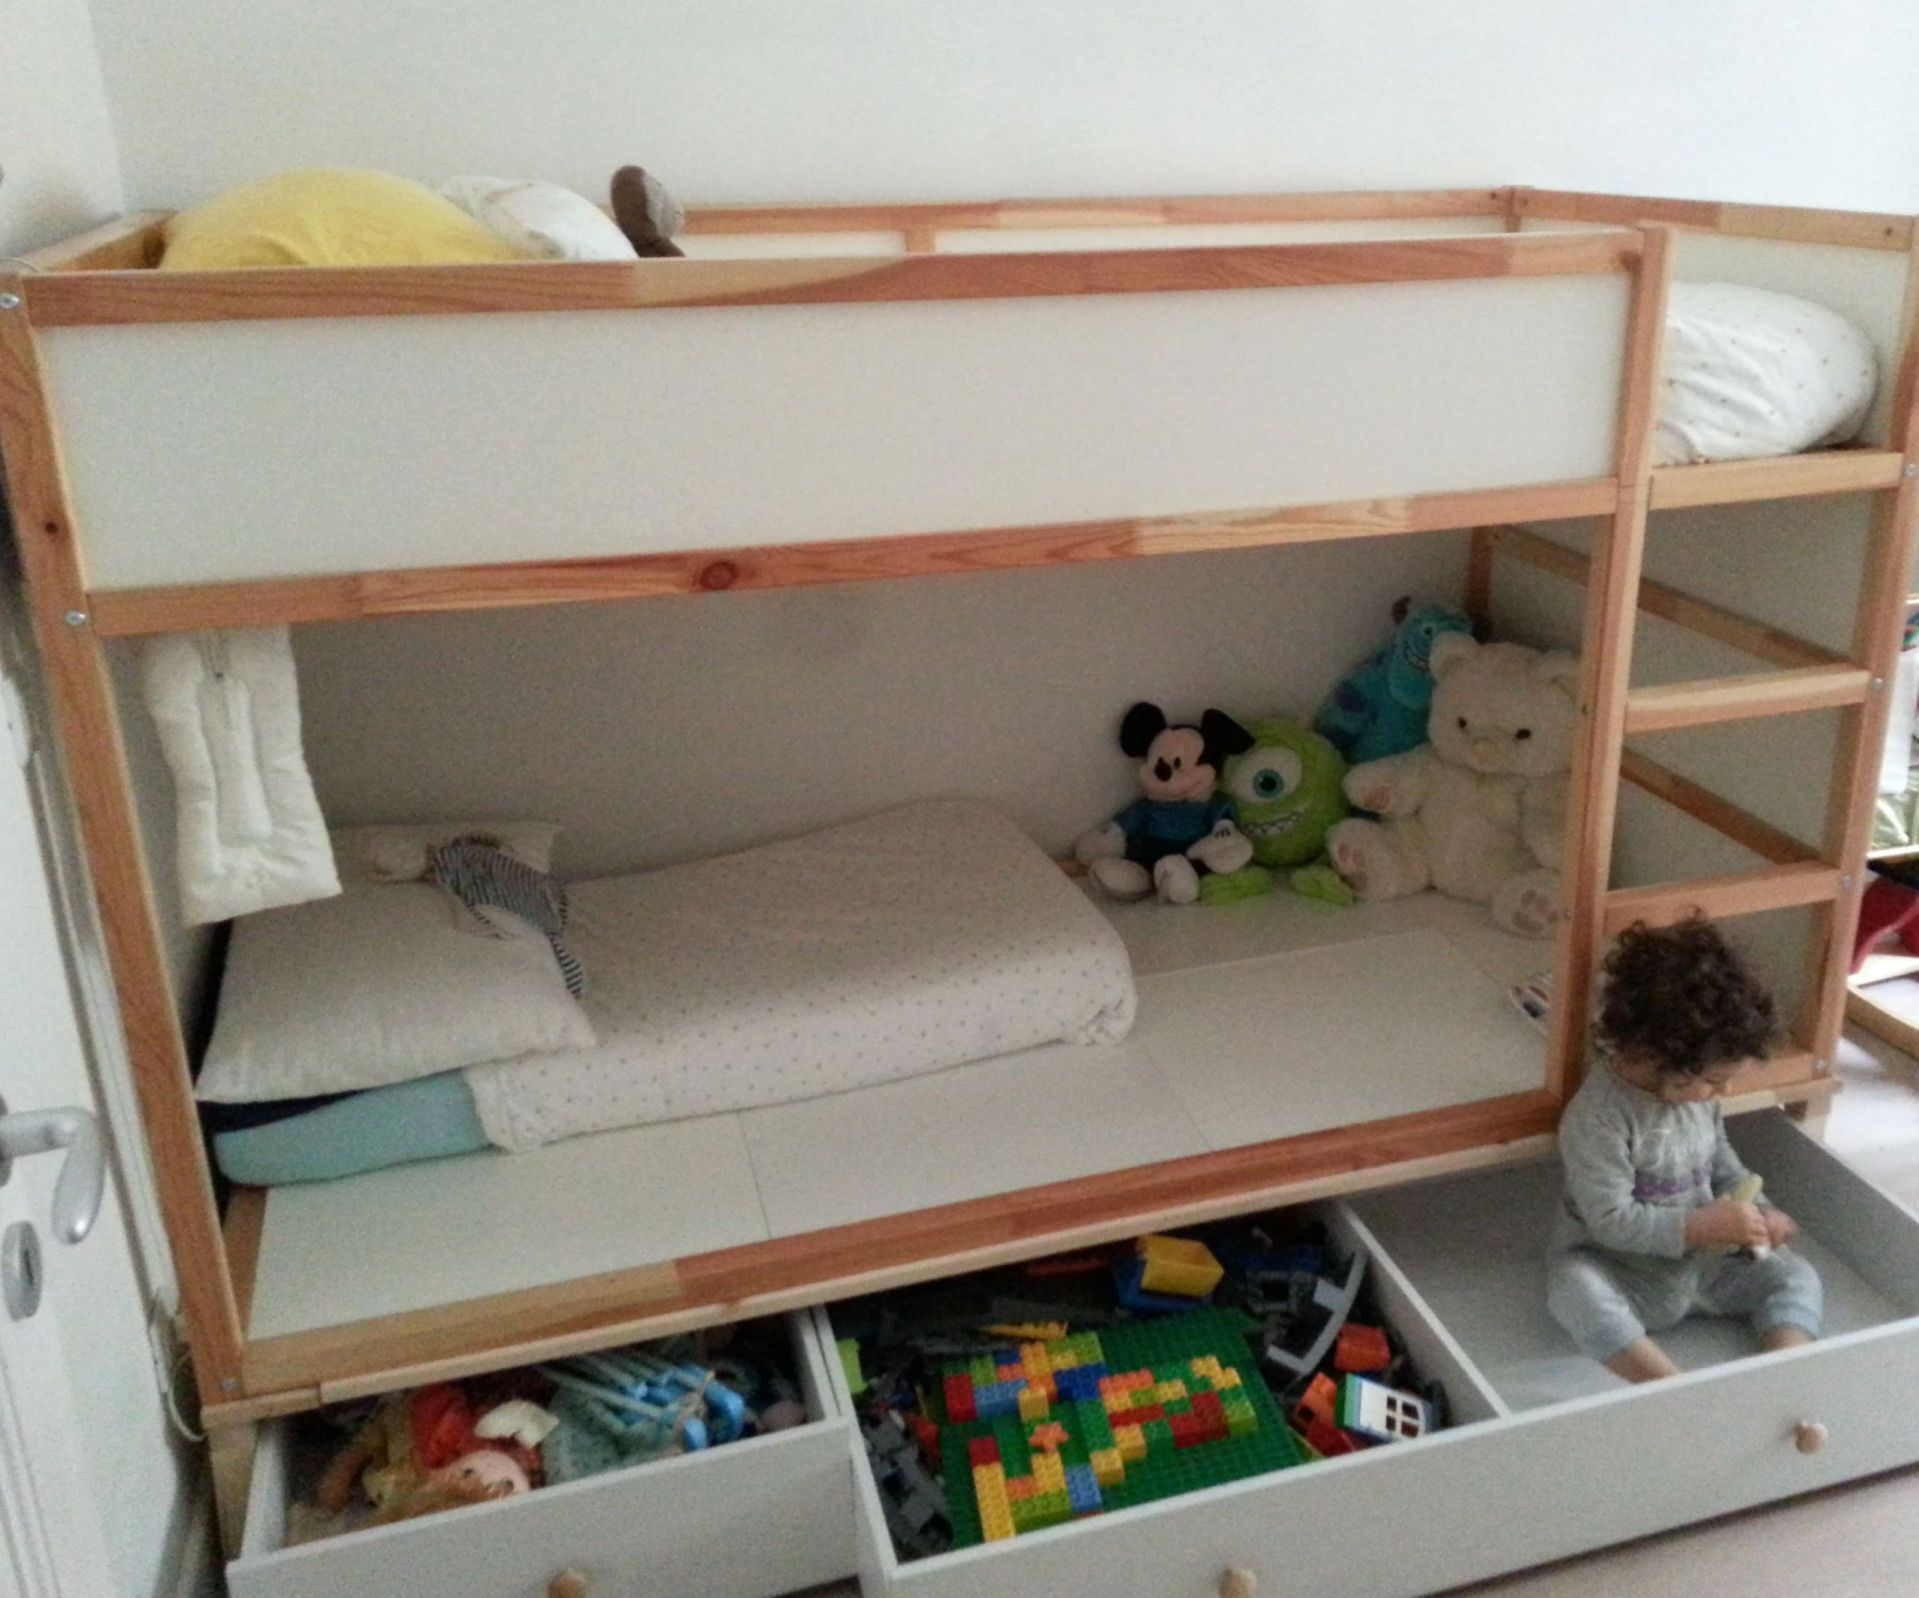 28 Types Of Ikea Bed Hack Kids Kura Girl Rooms 84 Freehomeideas Com Ikea Kura Bed Ikea Bed Kids Shared Bedroom